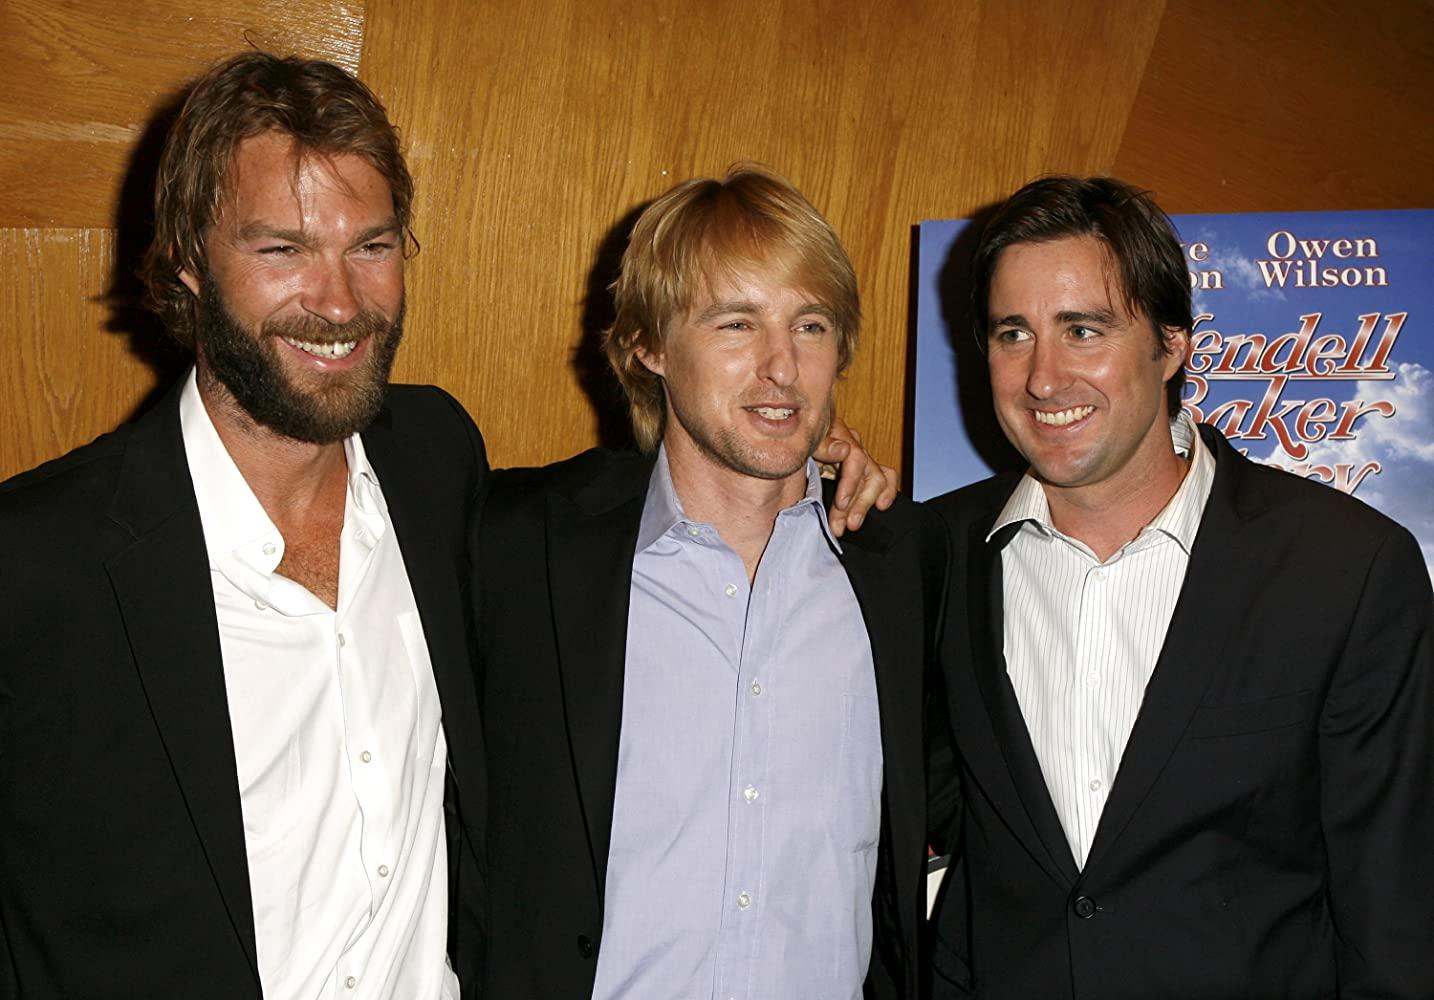 Luke Wilson, Owen Wilson, and Andrew Wilson